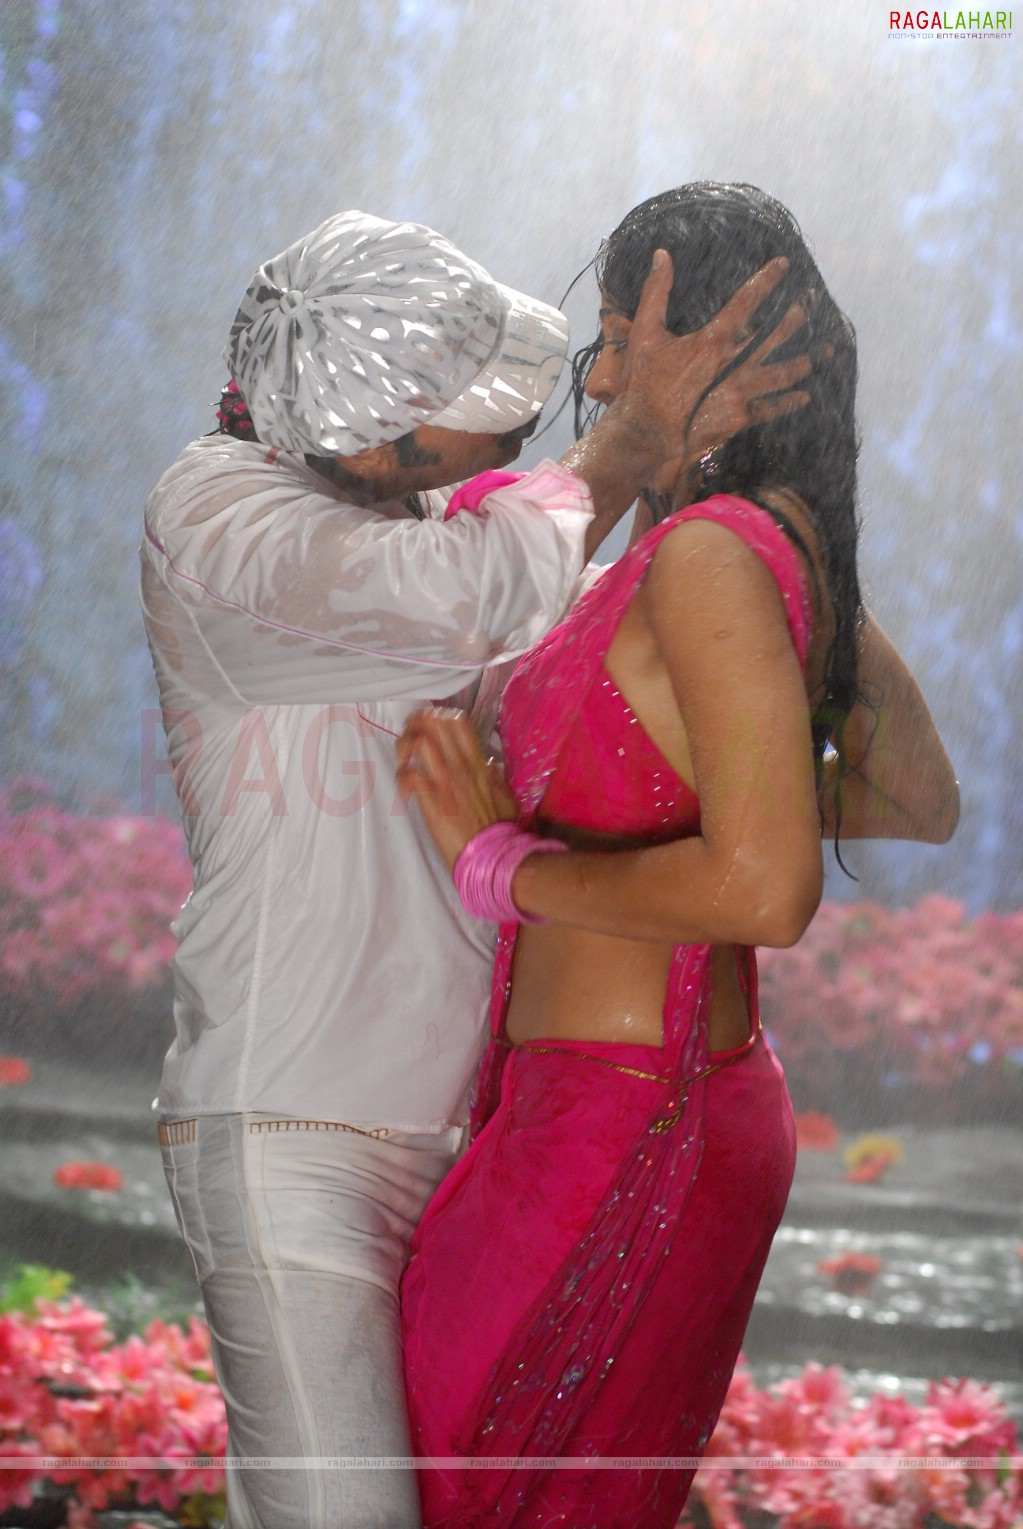 Anushka Sharma, Virat Kohli enjoy a stroll on Cardiff streets Anushka shetty kiss photos